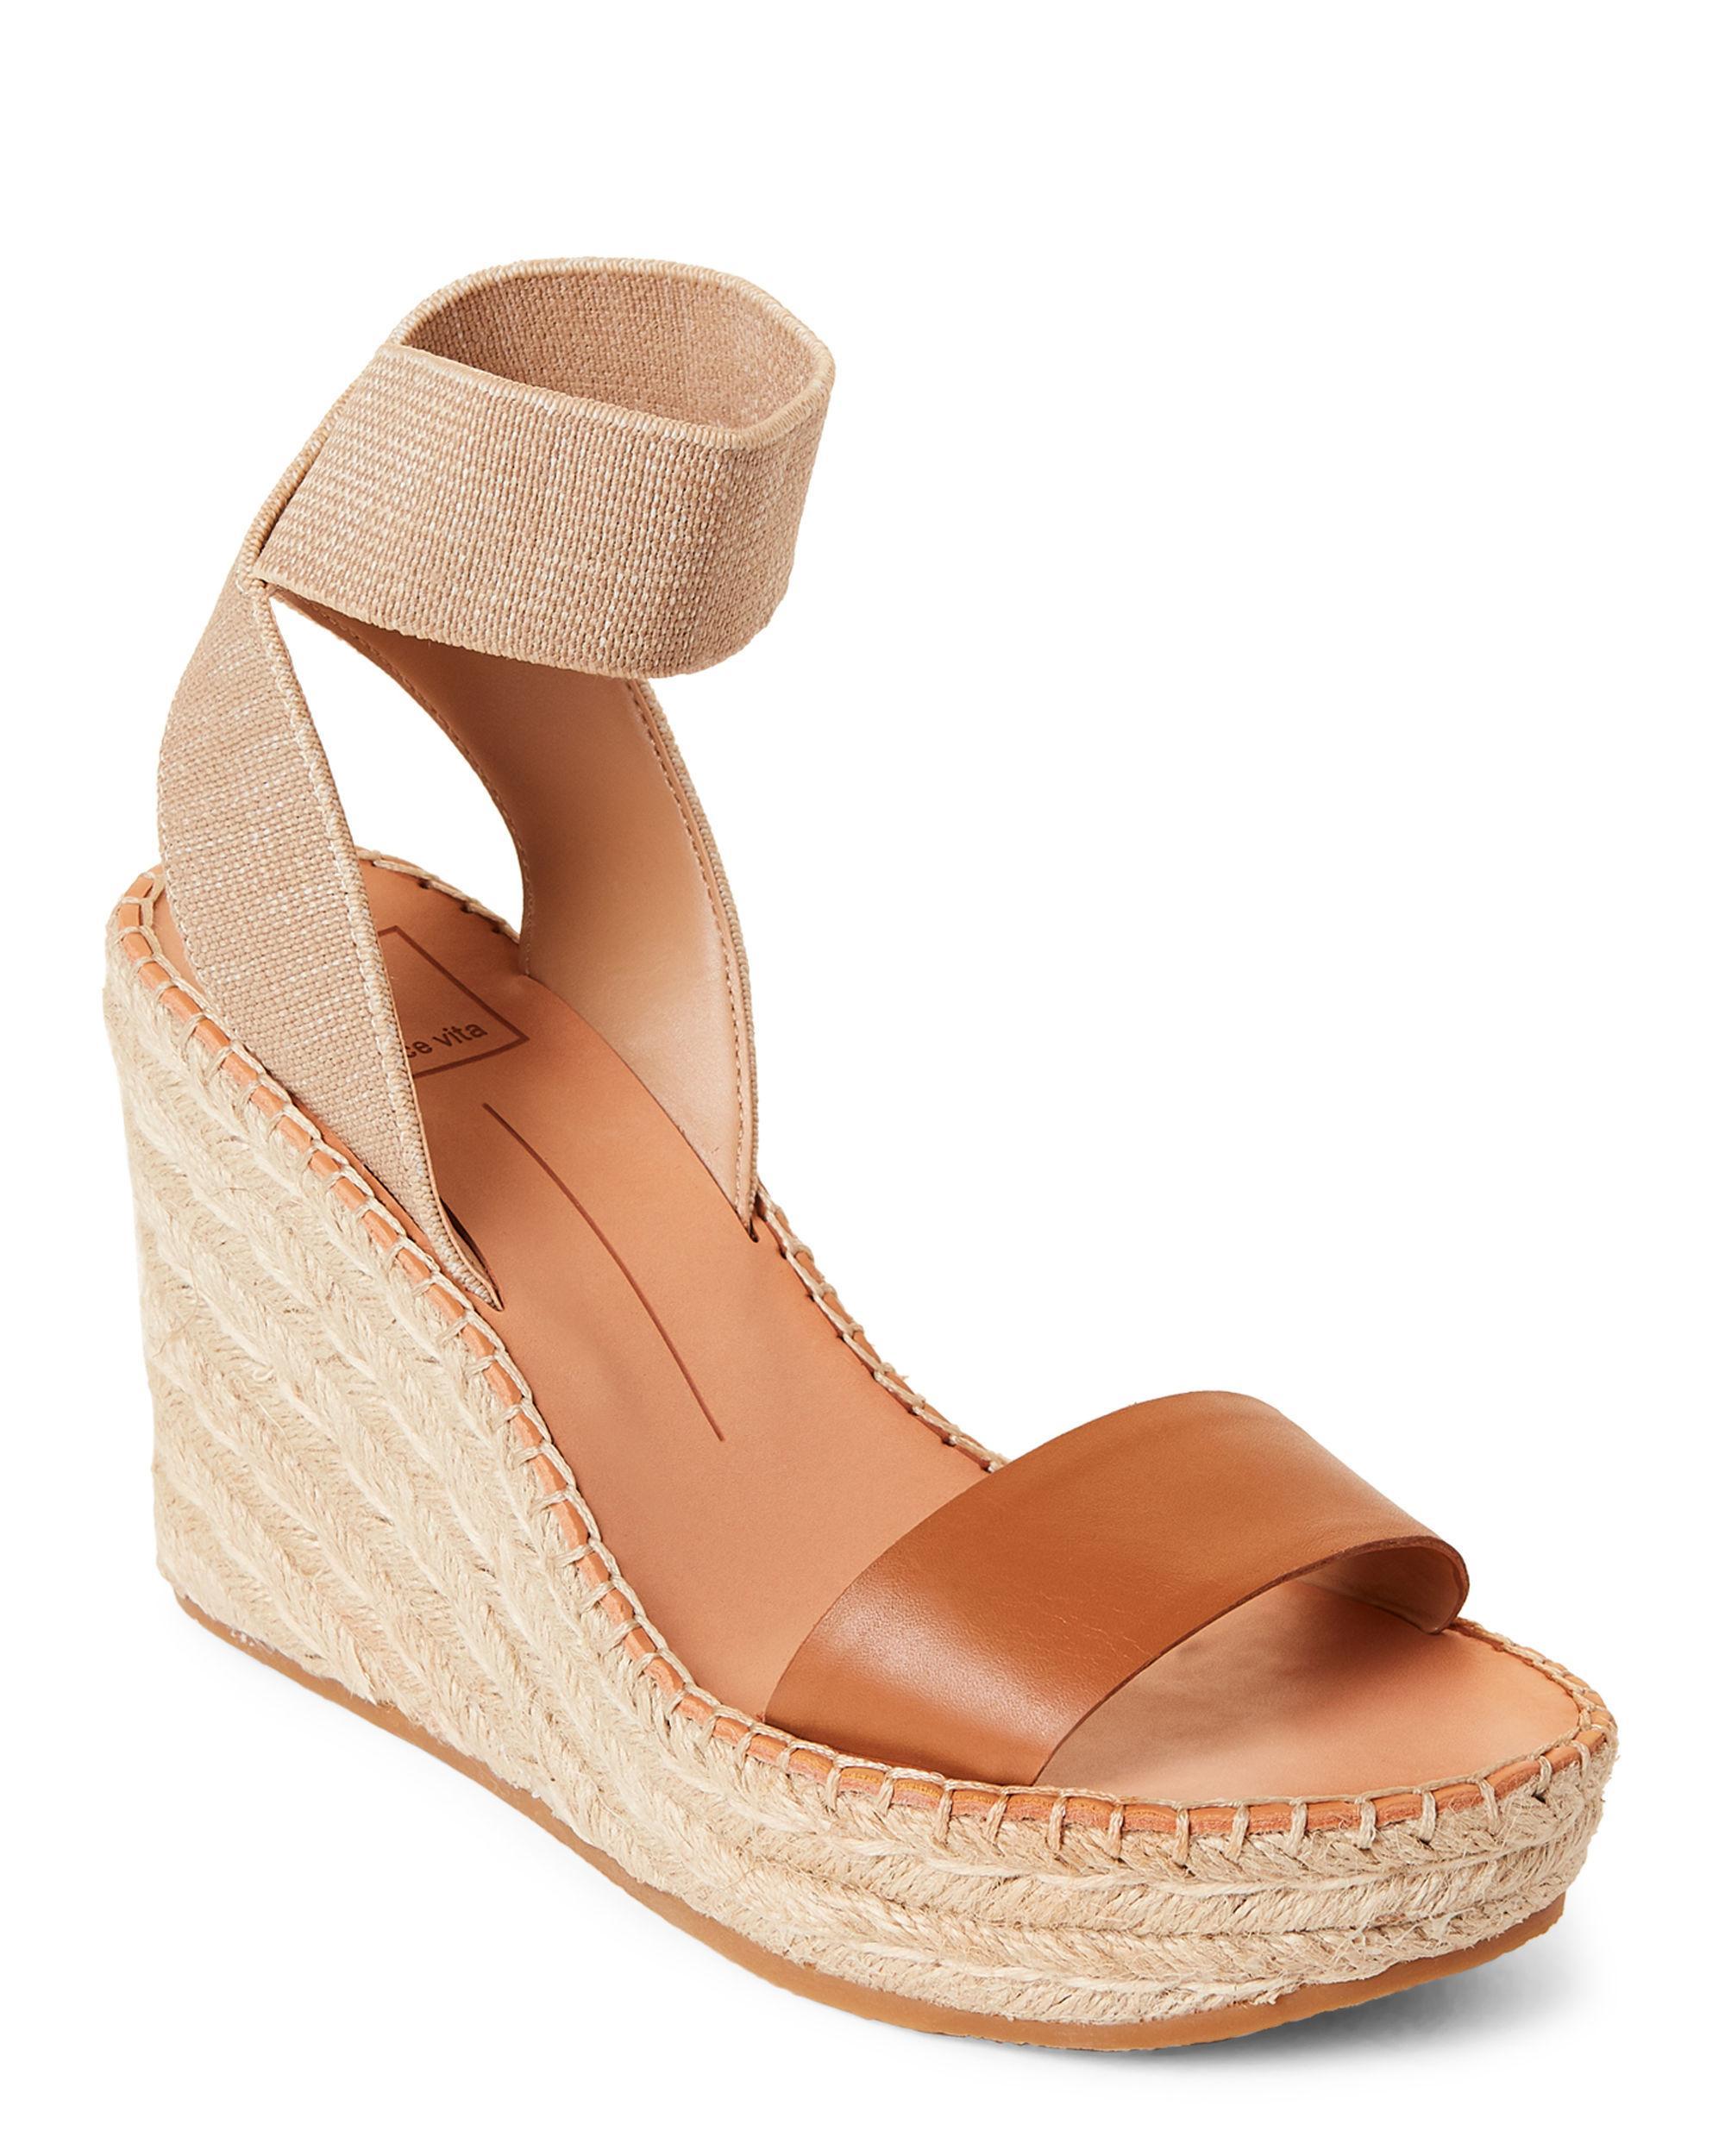 1b2679b2613 Lyst - Dolce Vita Pavlin Espadrille Wedge Sandals in Brown